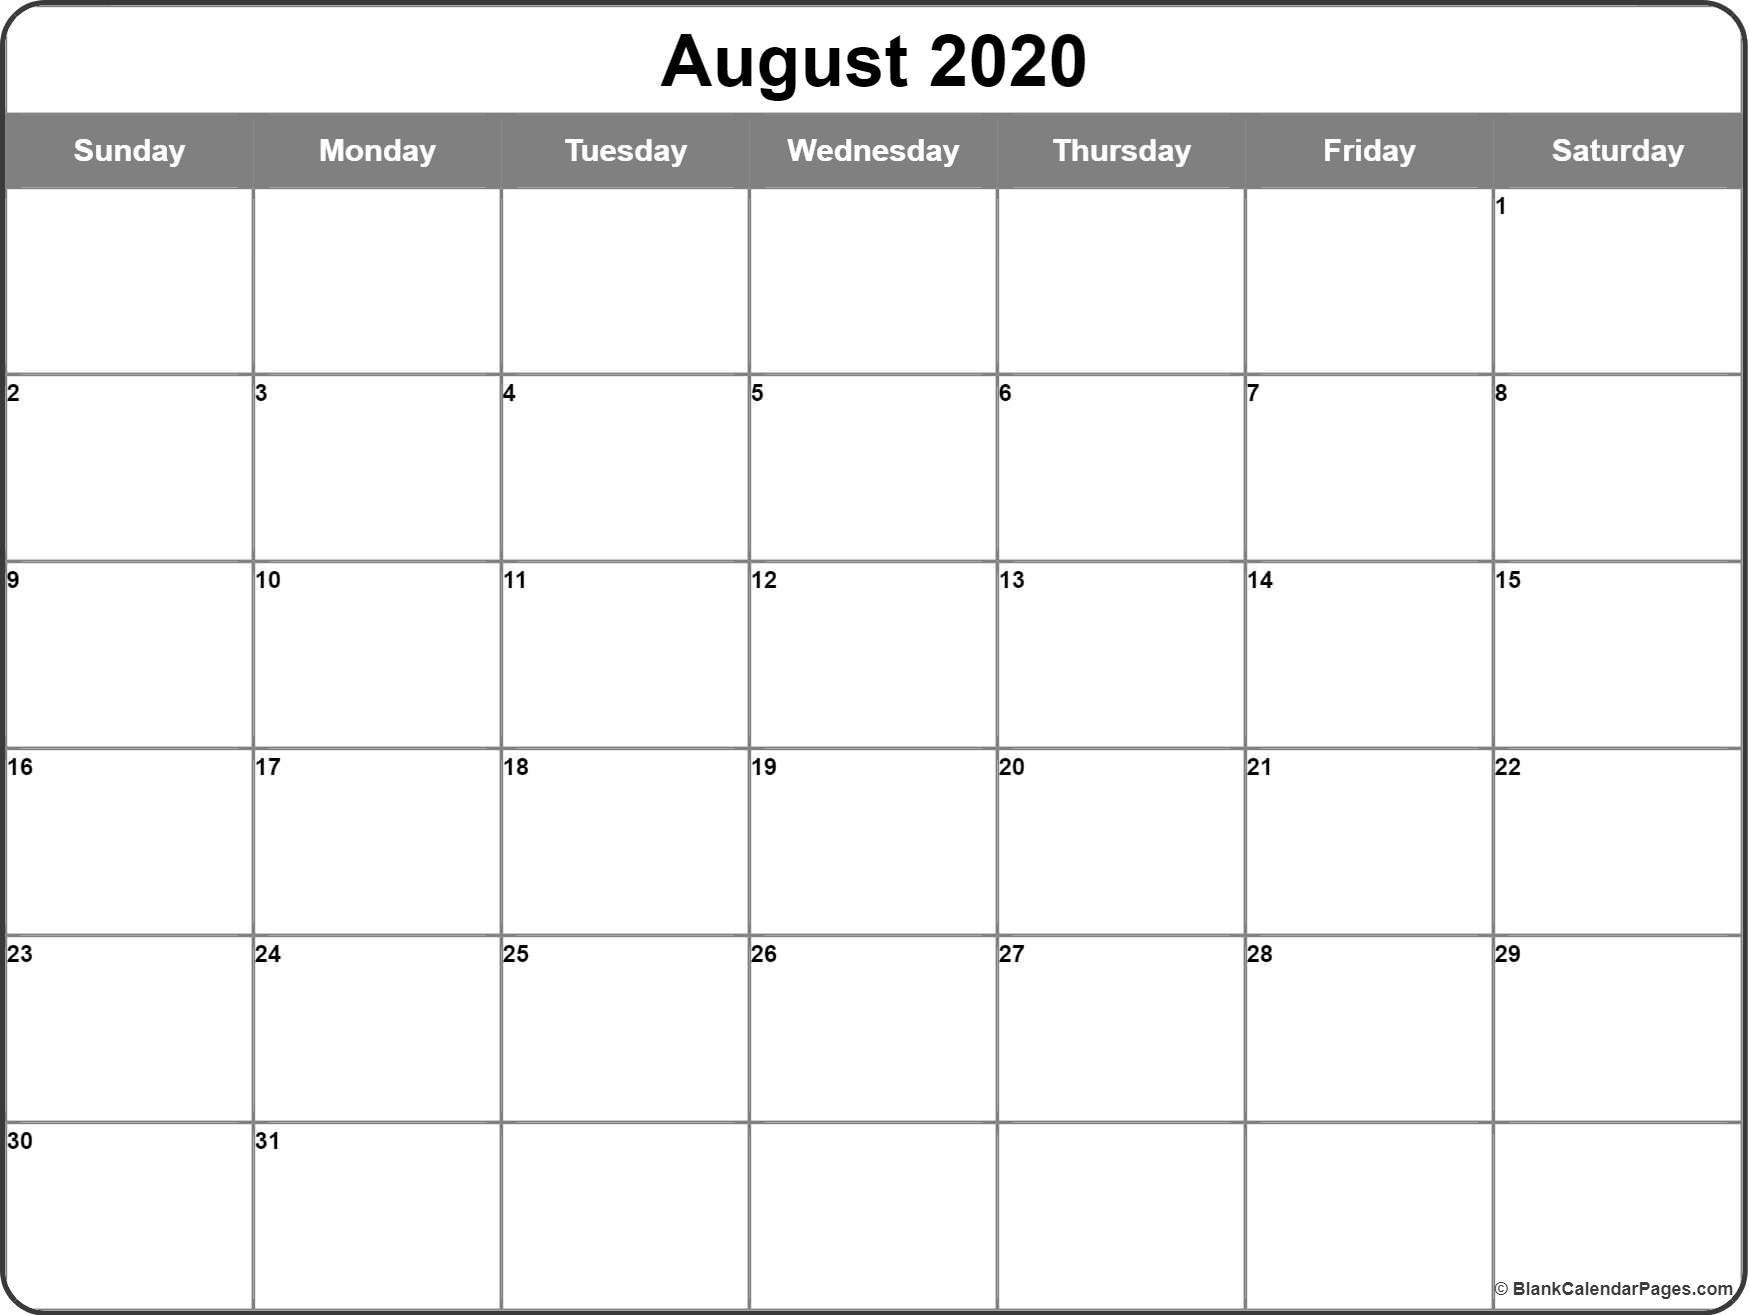 August 2020 Calendar | Free Printable Monthly Calendars-Monday Thru Friday Calendar Template 2020